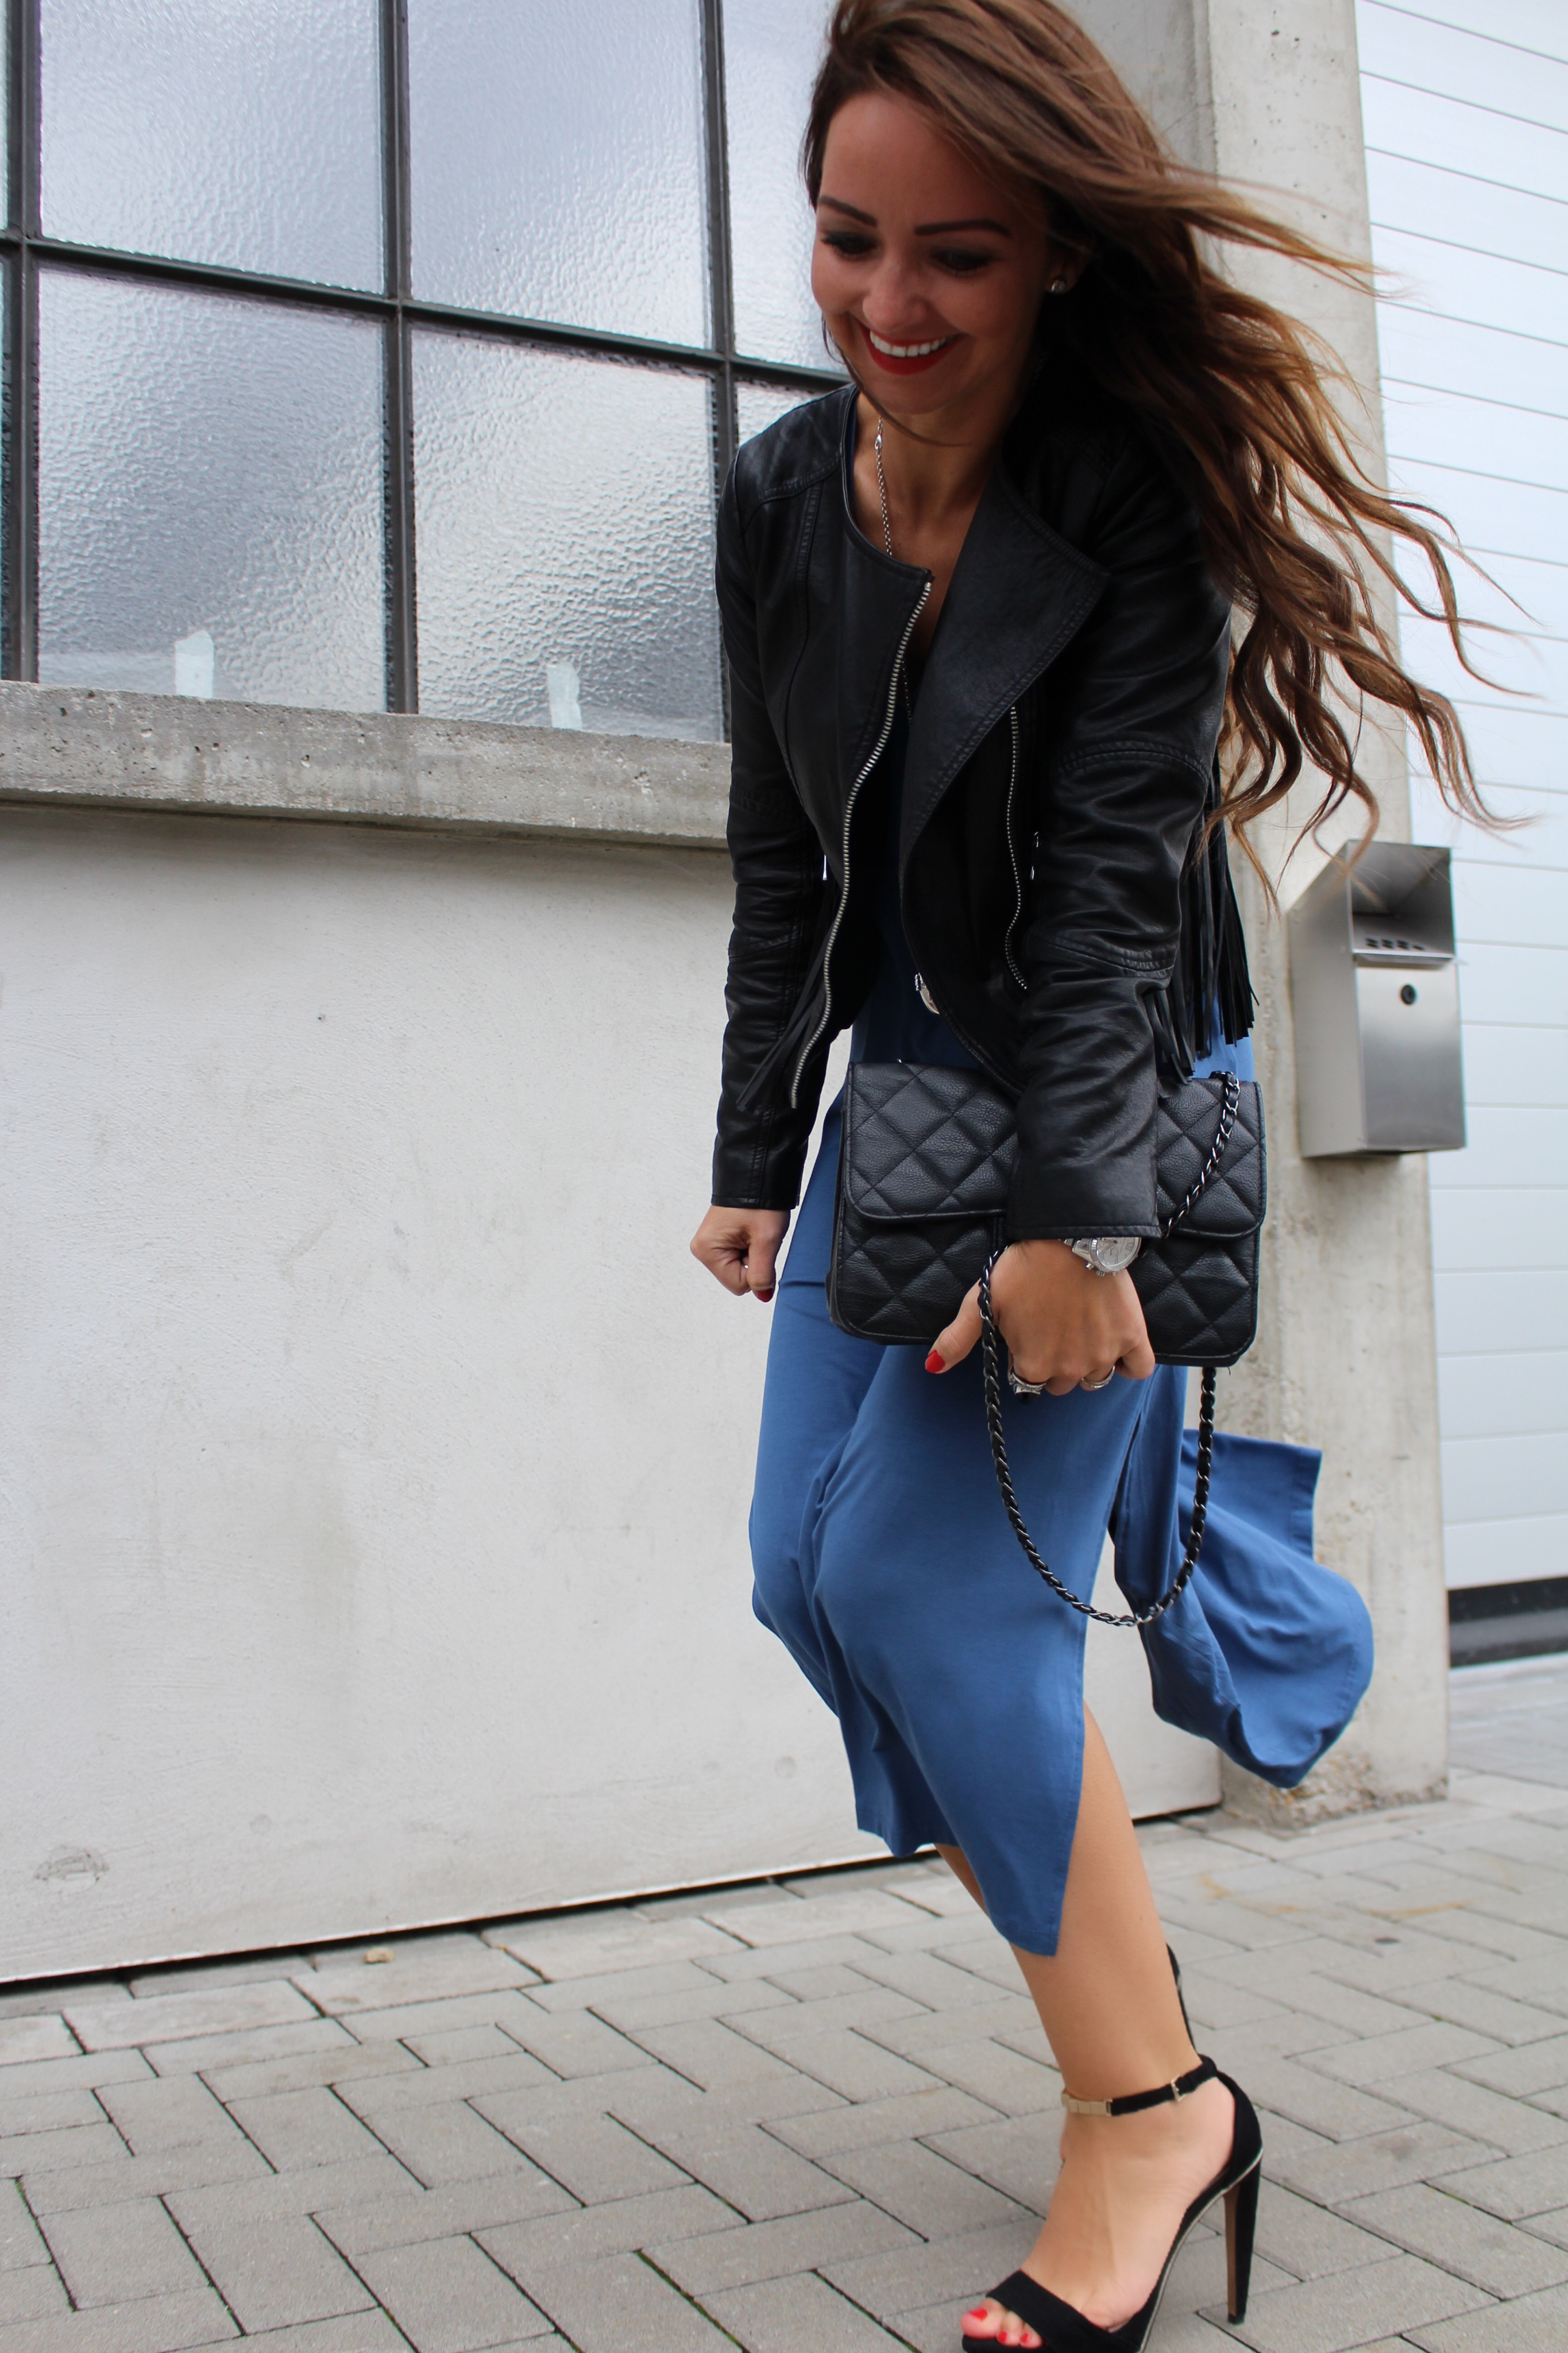 Fashioncircuz by Jenny img_0691 LOOK 1 - PLATFORM FASHION